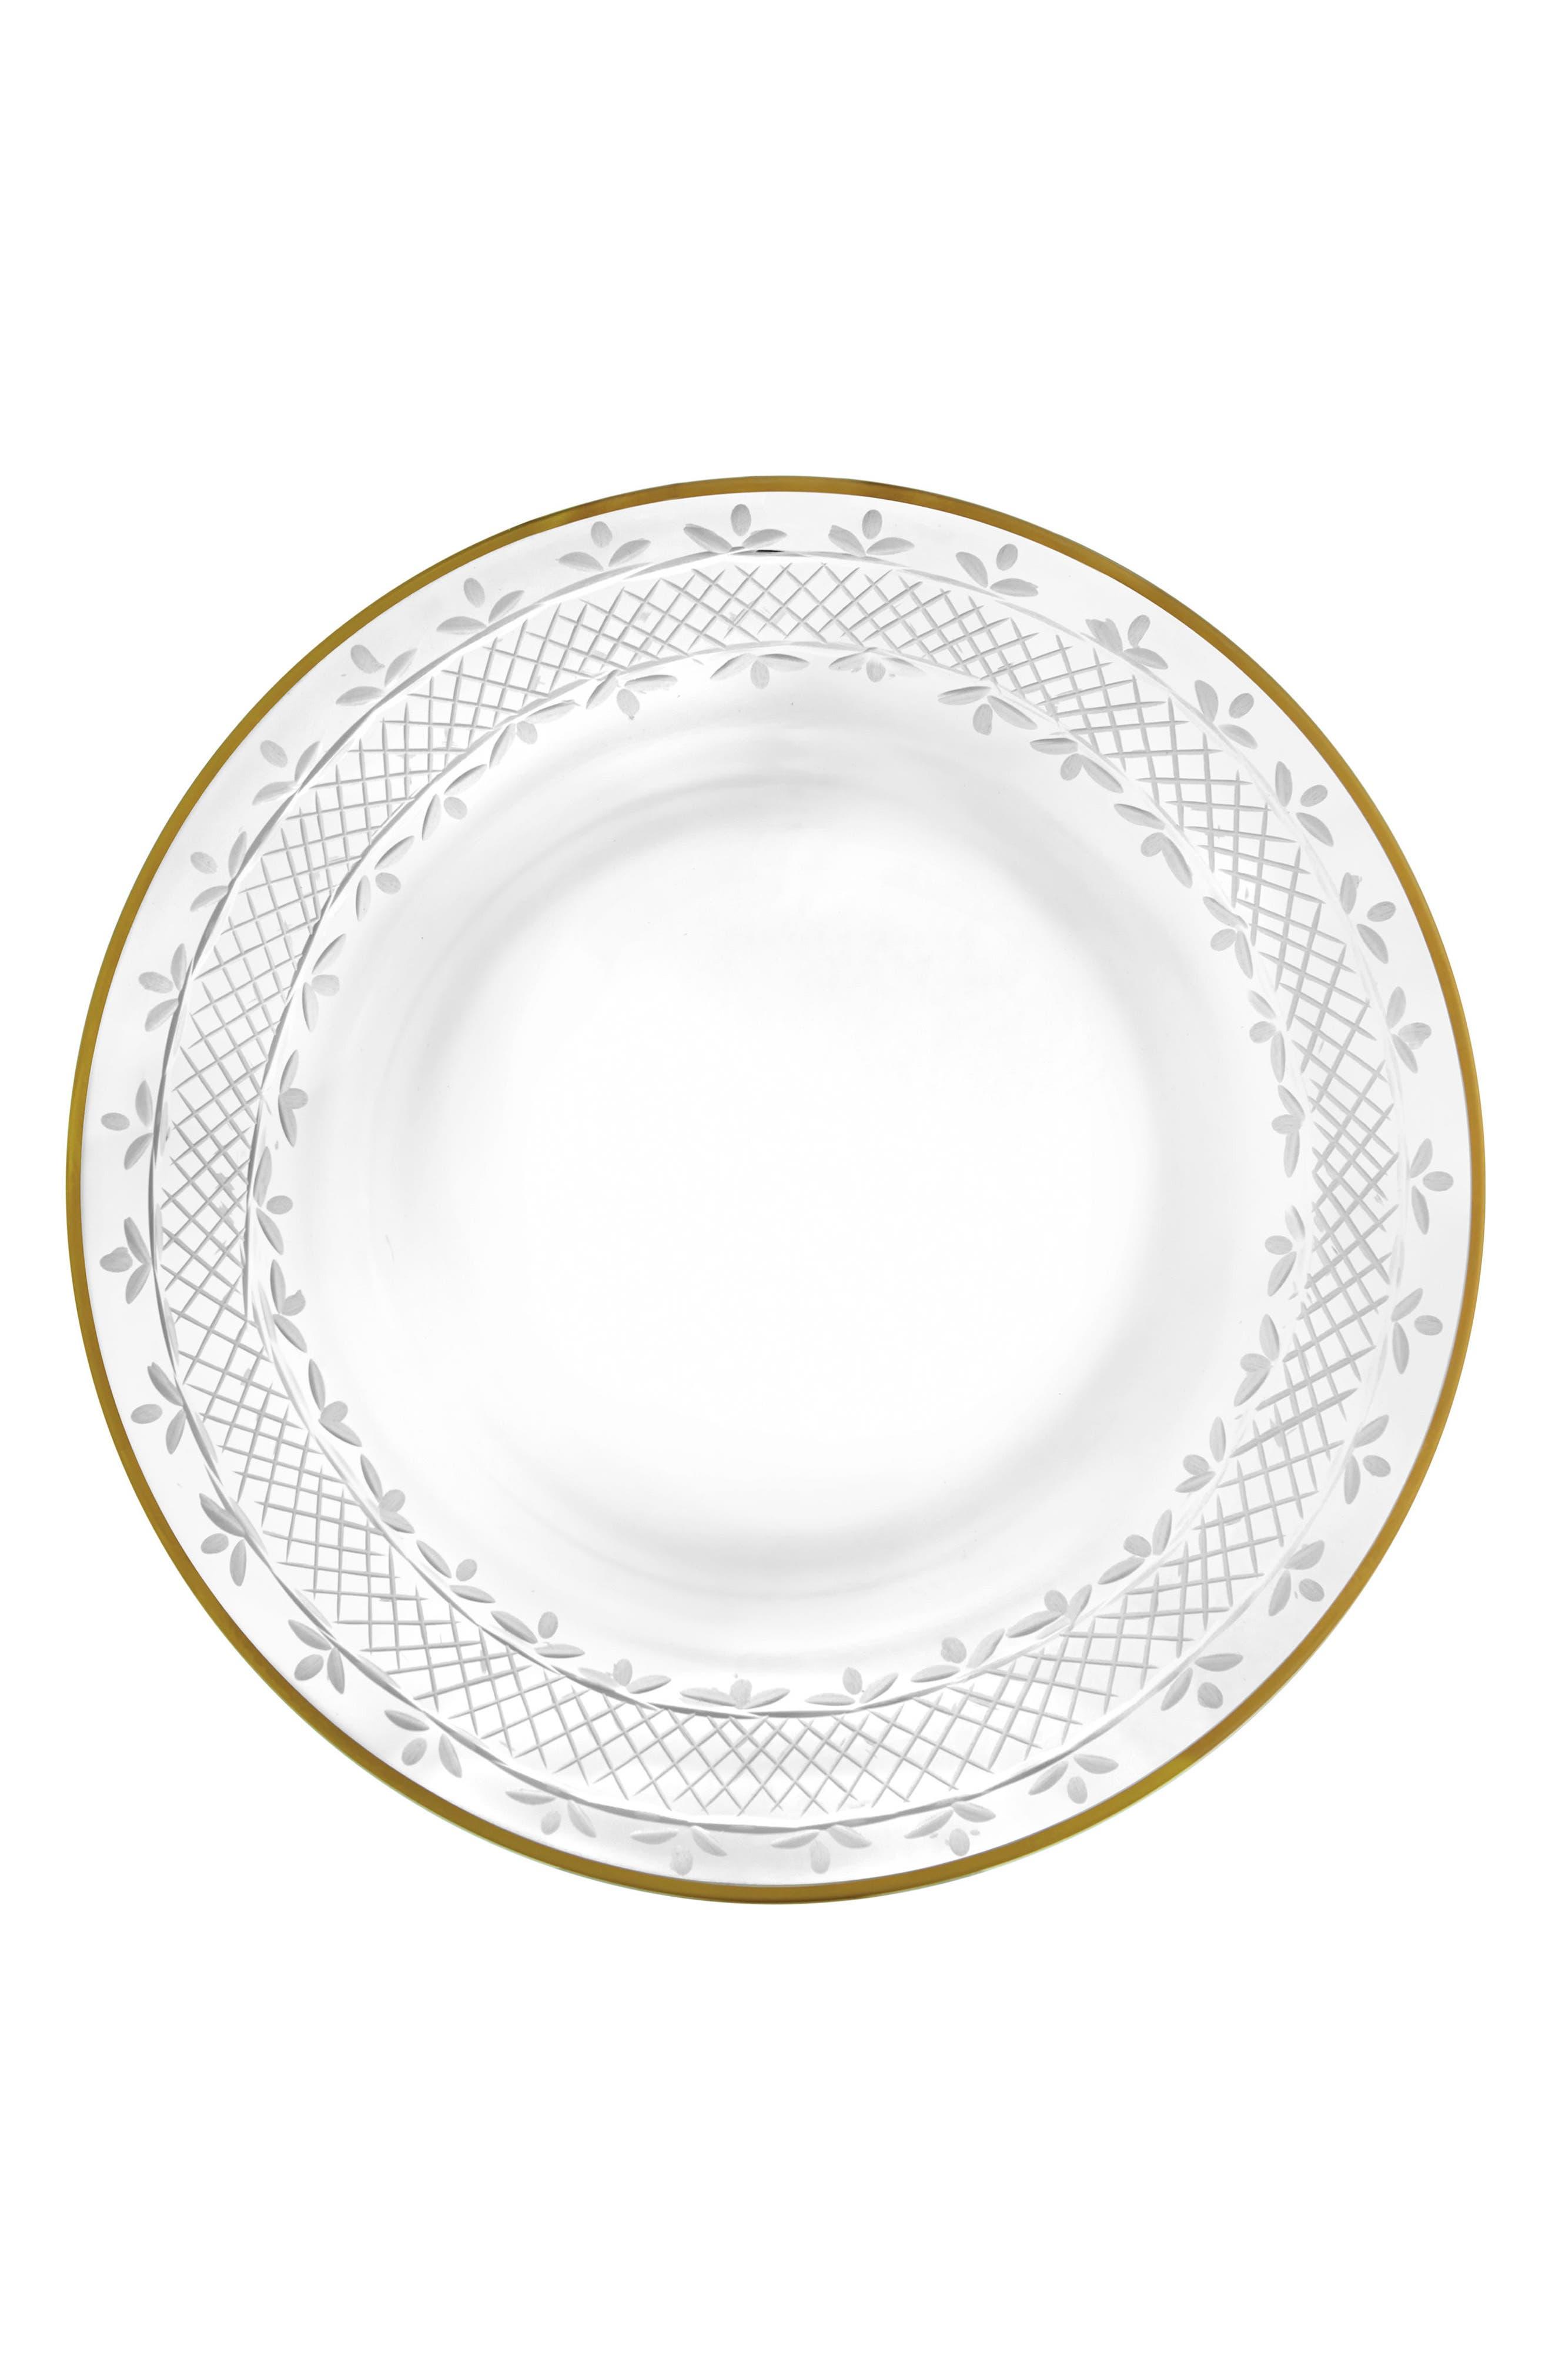 Main Image - Arte Italica Semplice Charger Plate